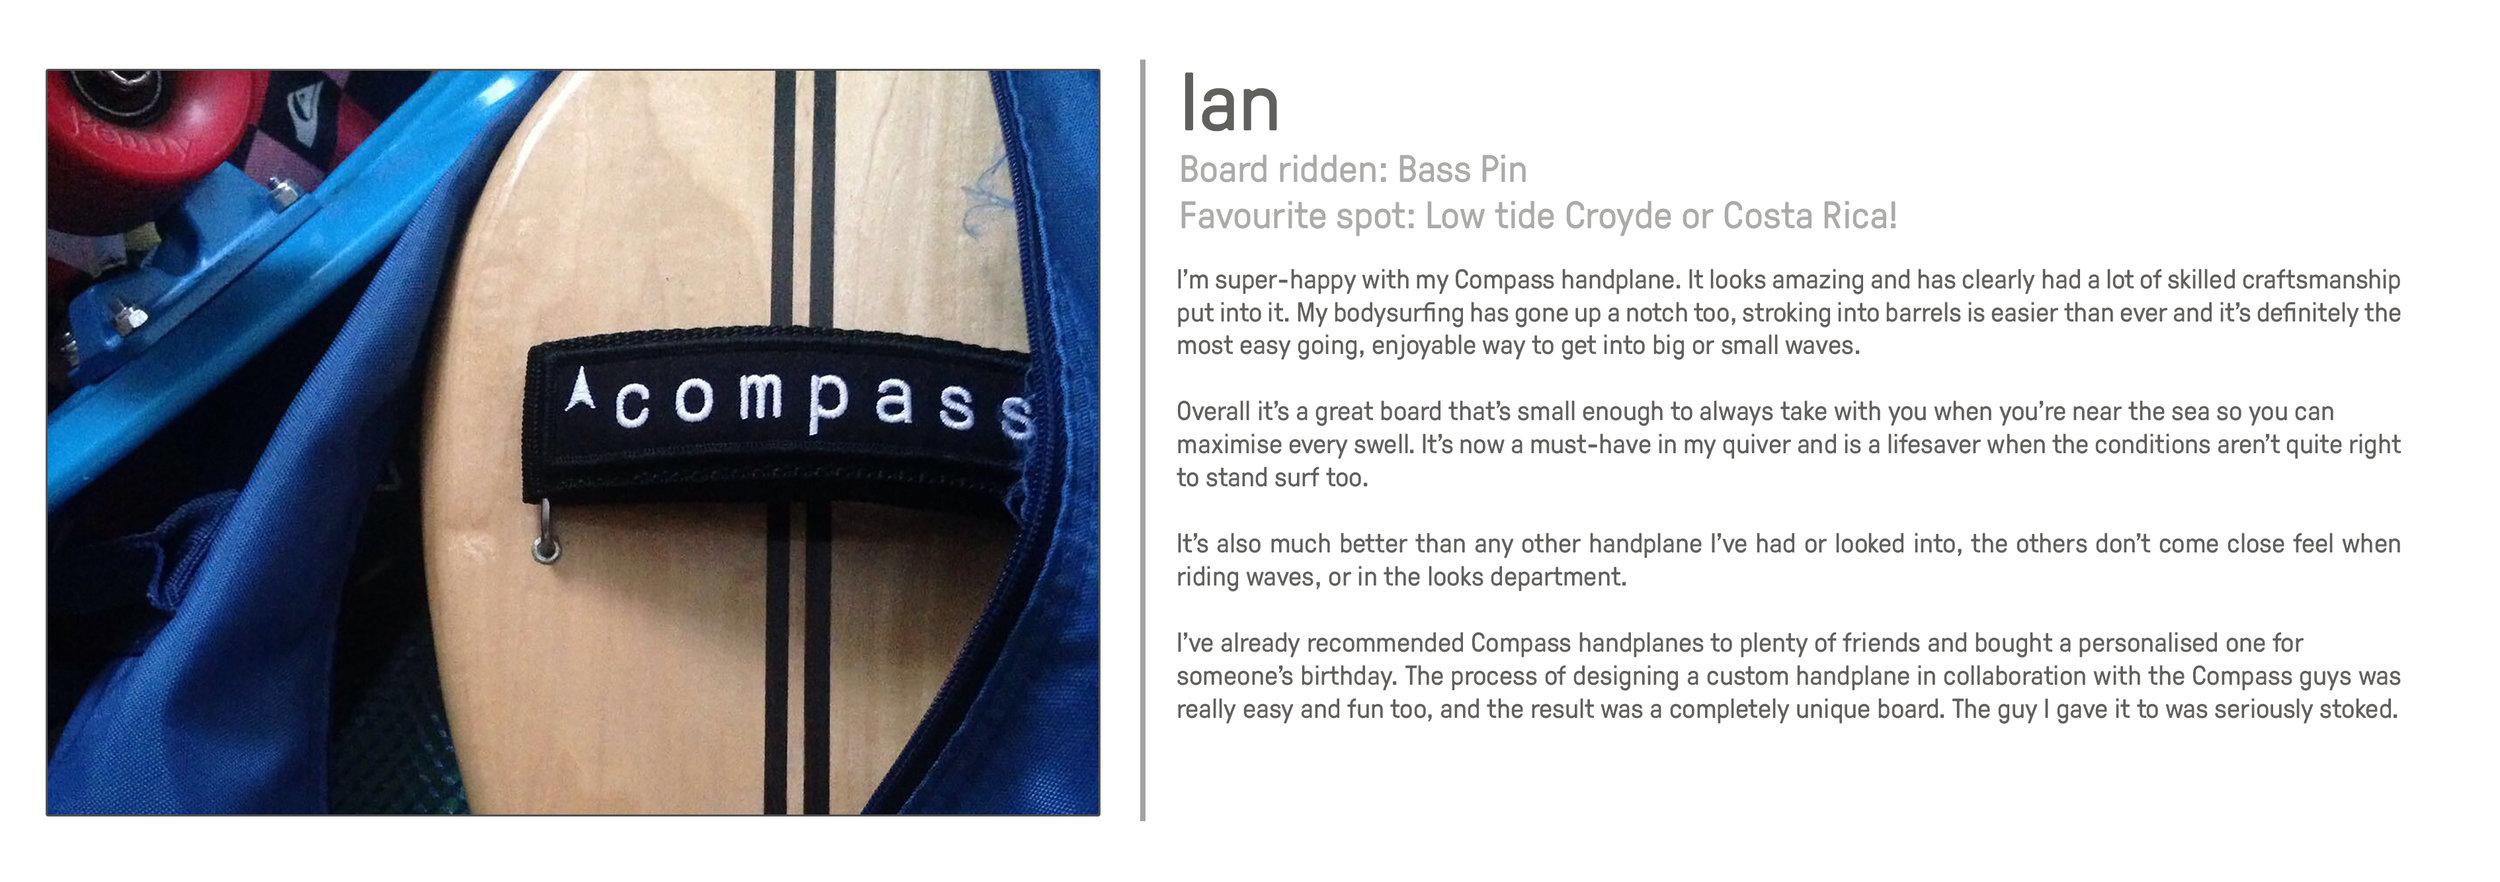 Ian review.jpg